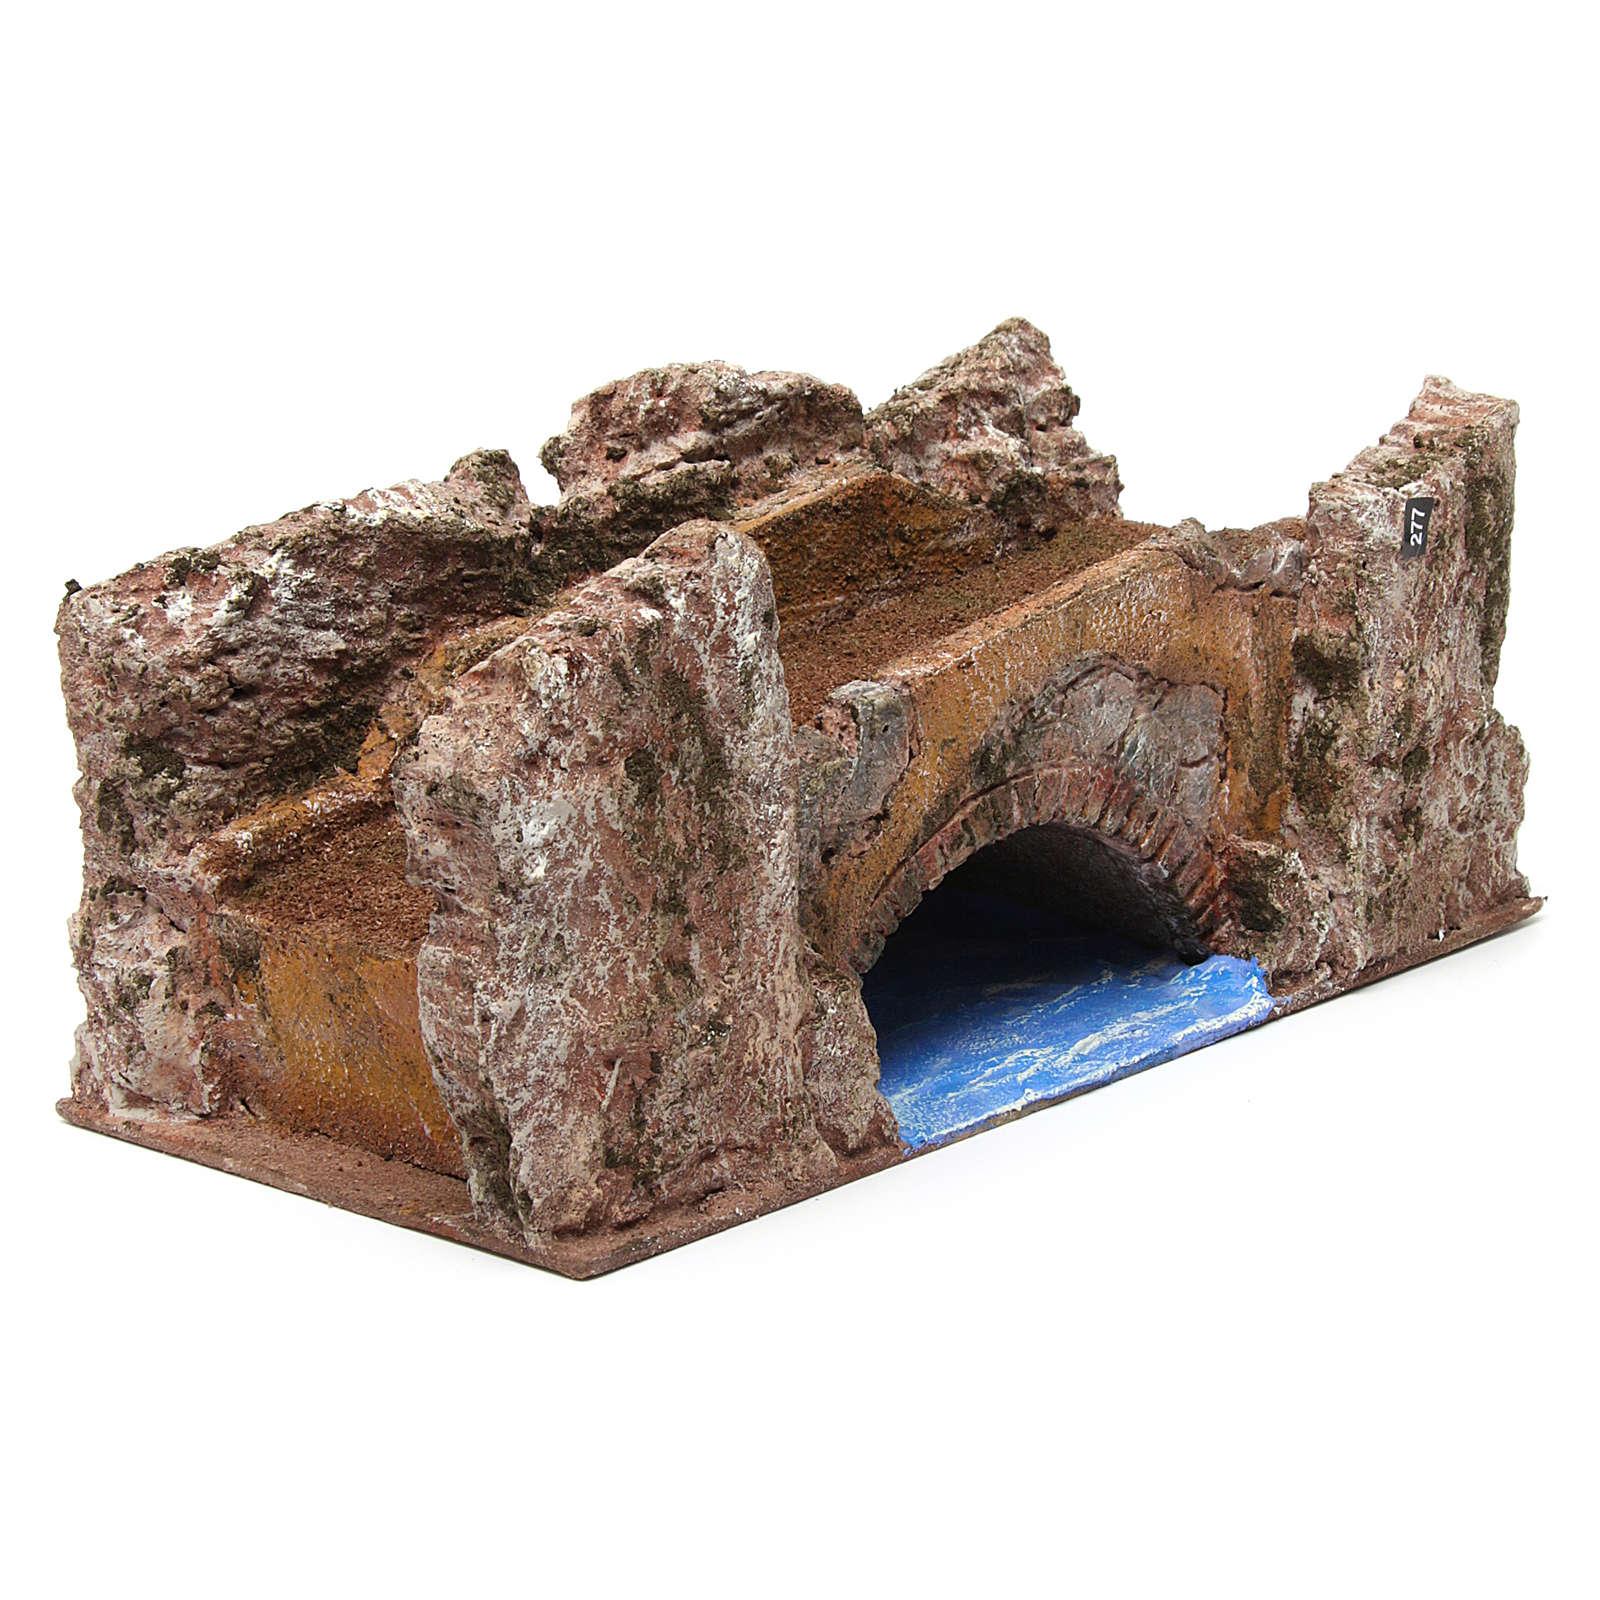 Arroyo puente para belén 10 cm 15x30x15 cm 4